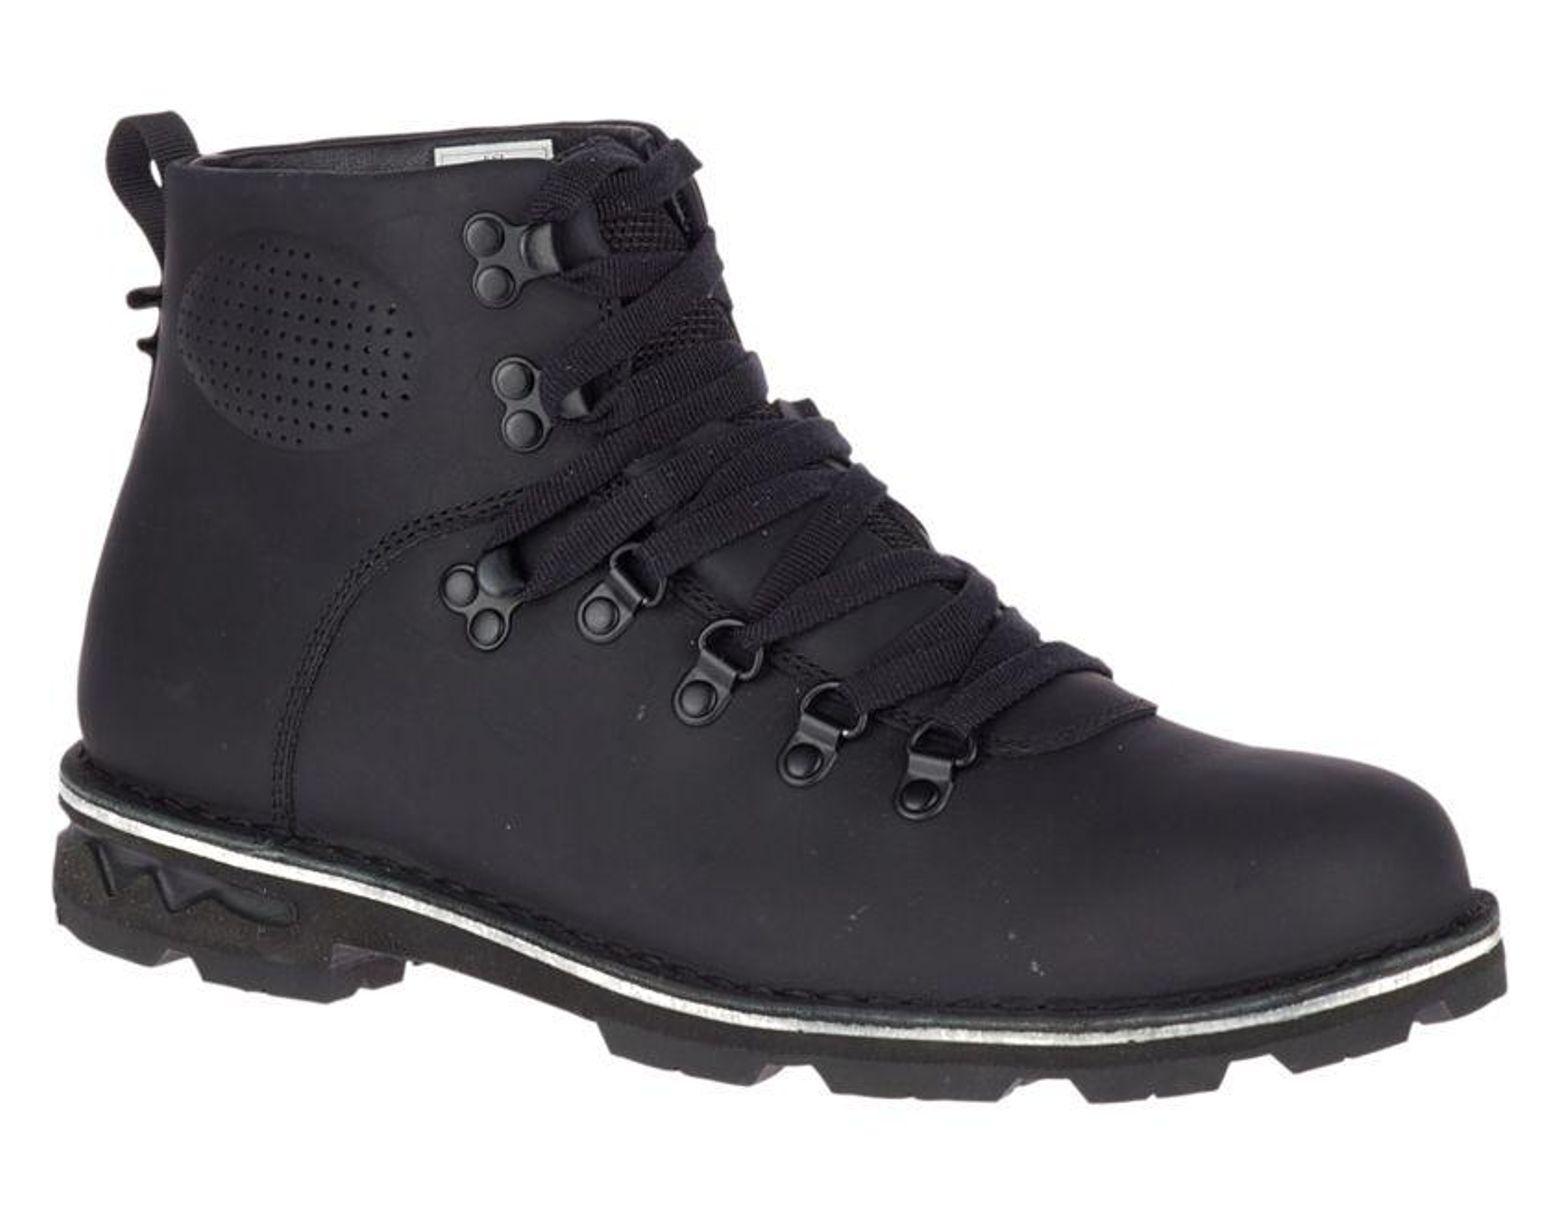 fb212ba3731 Men's Black Sugarbush Braden Mid Leather Waterproof